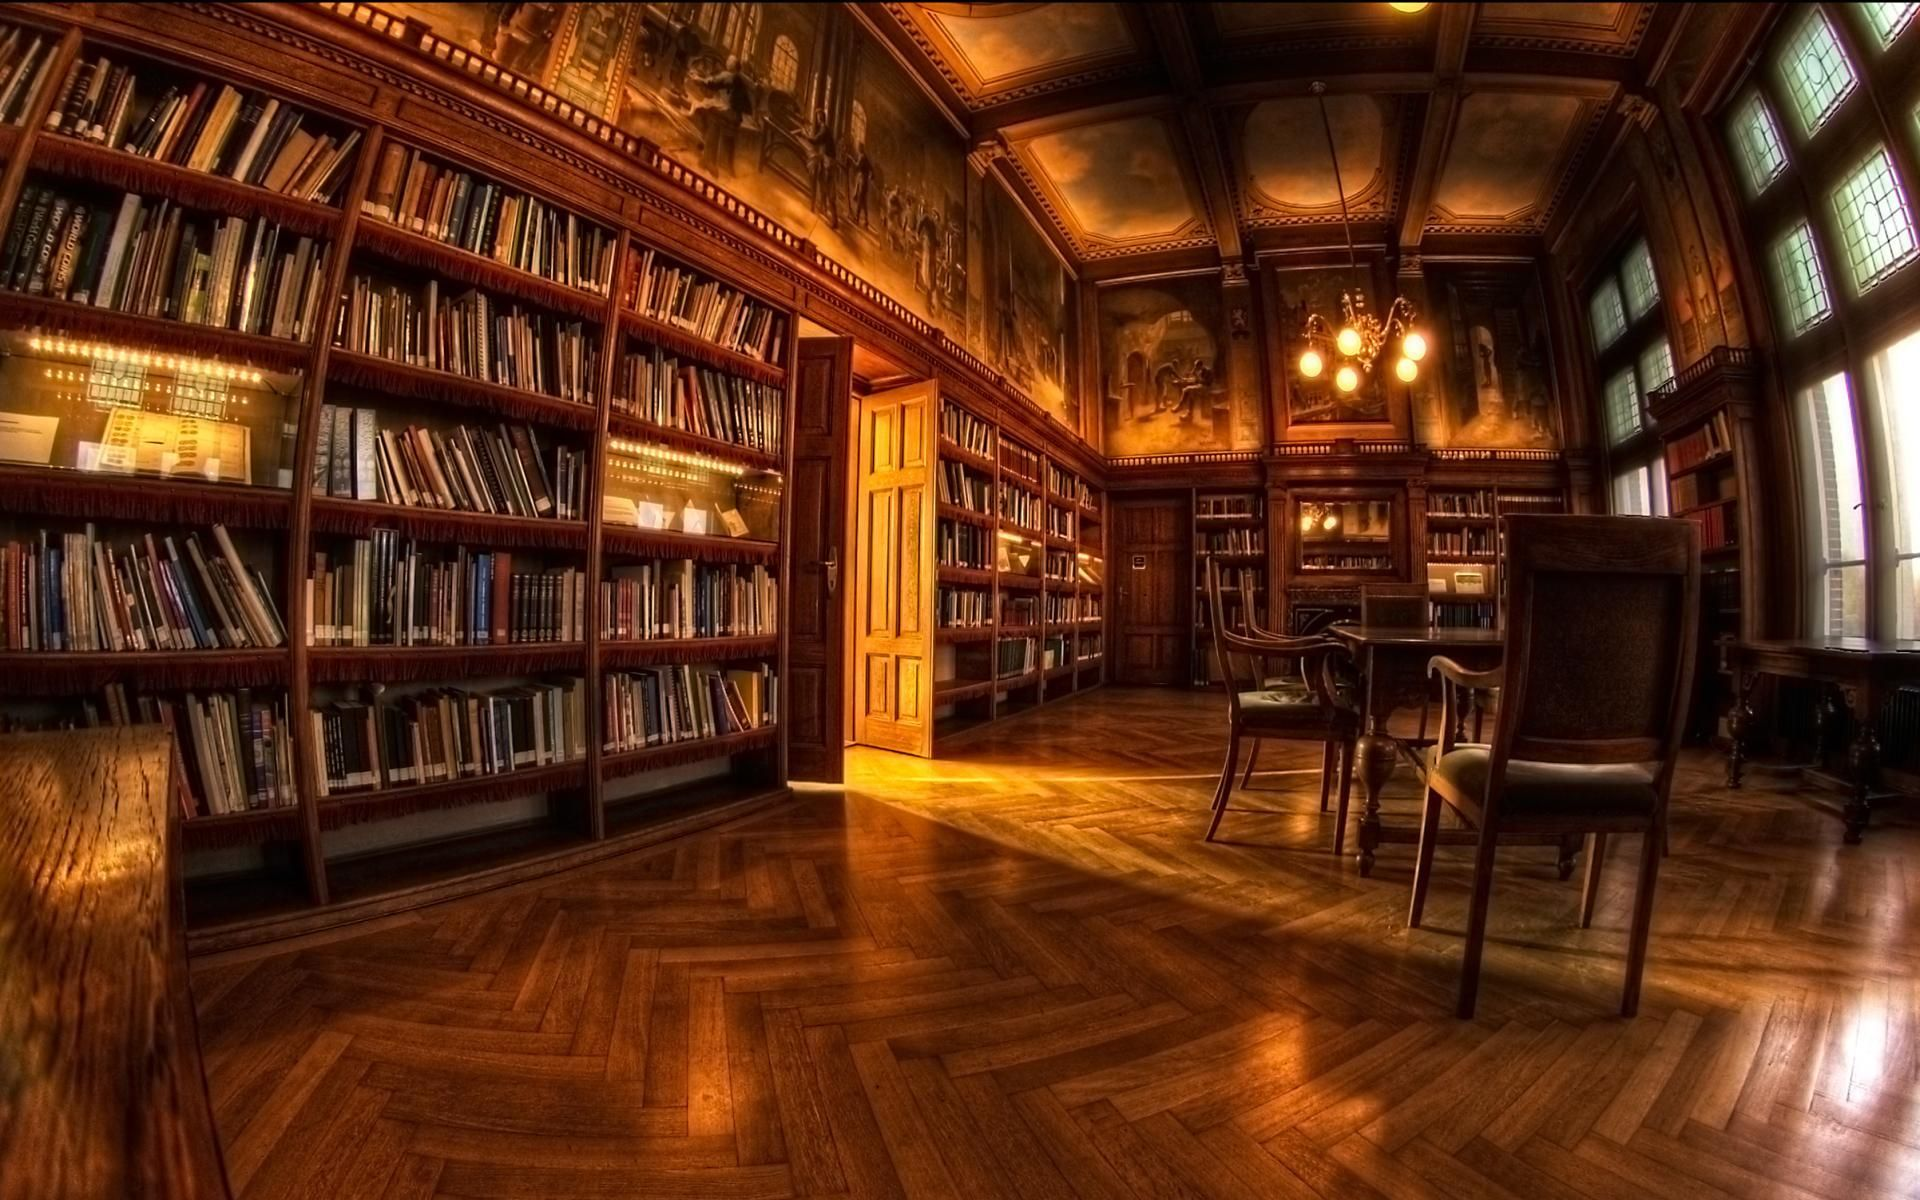 Library Photography Hd Wallpaper X B O O K S L I F E